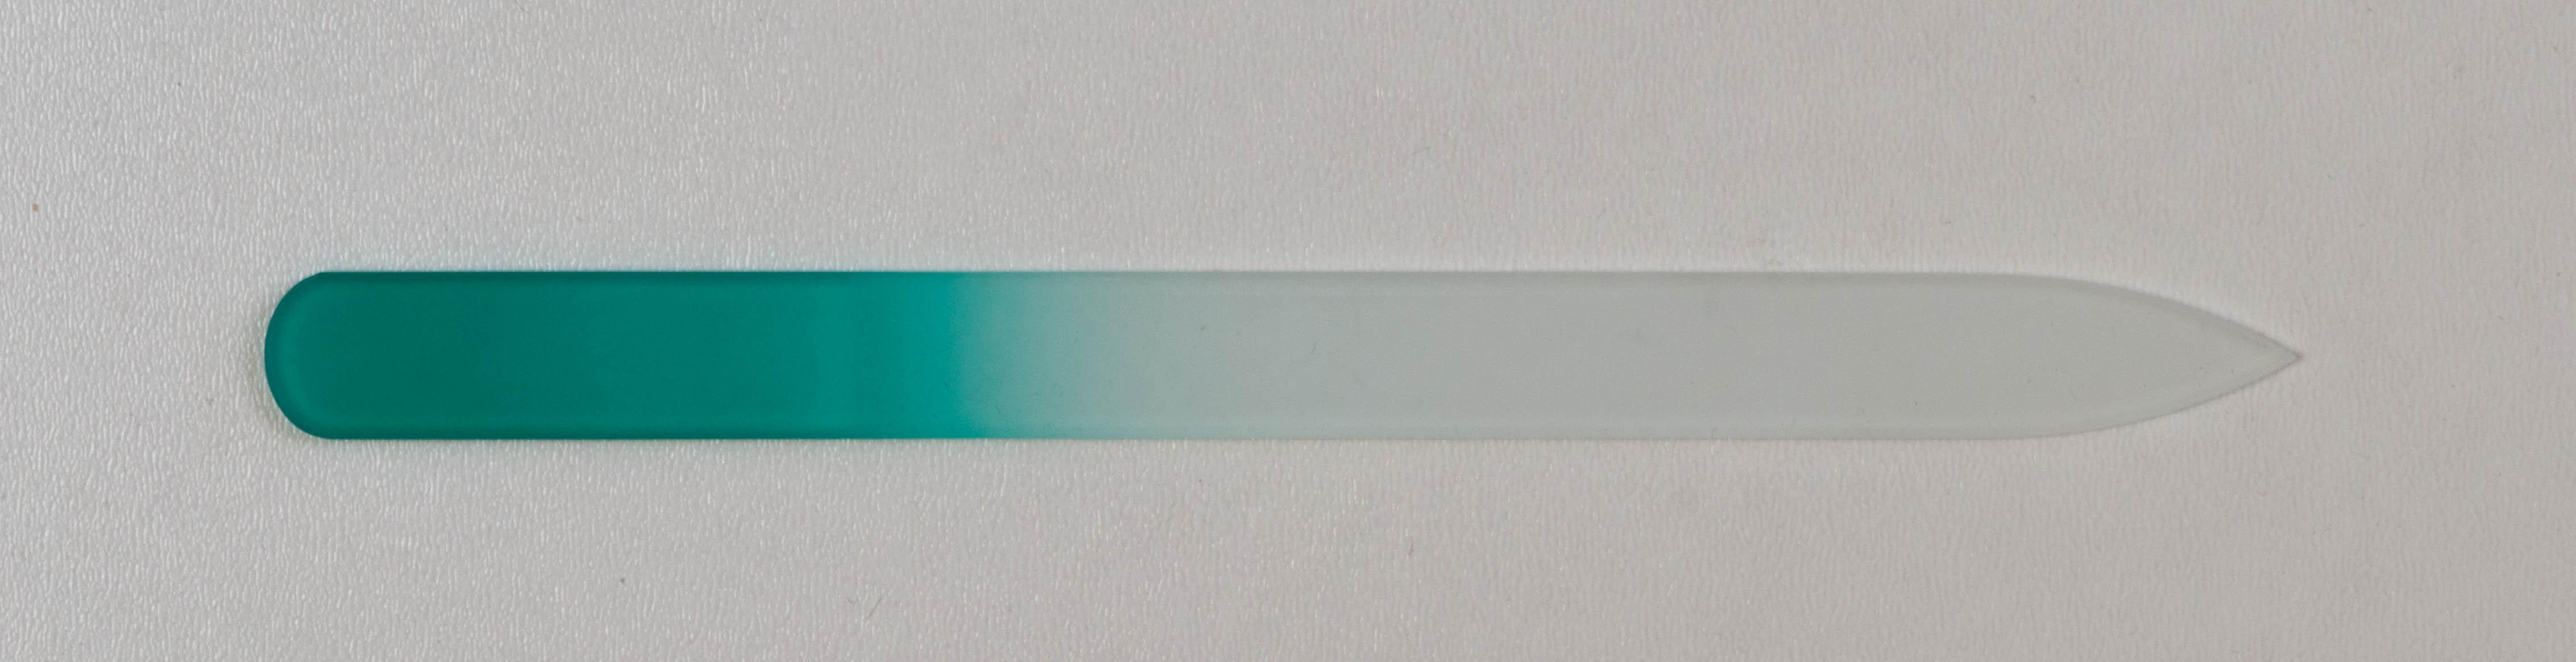 File:Glass nail file green.jpg - Wikimedia Commons